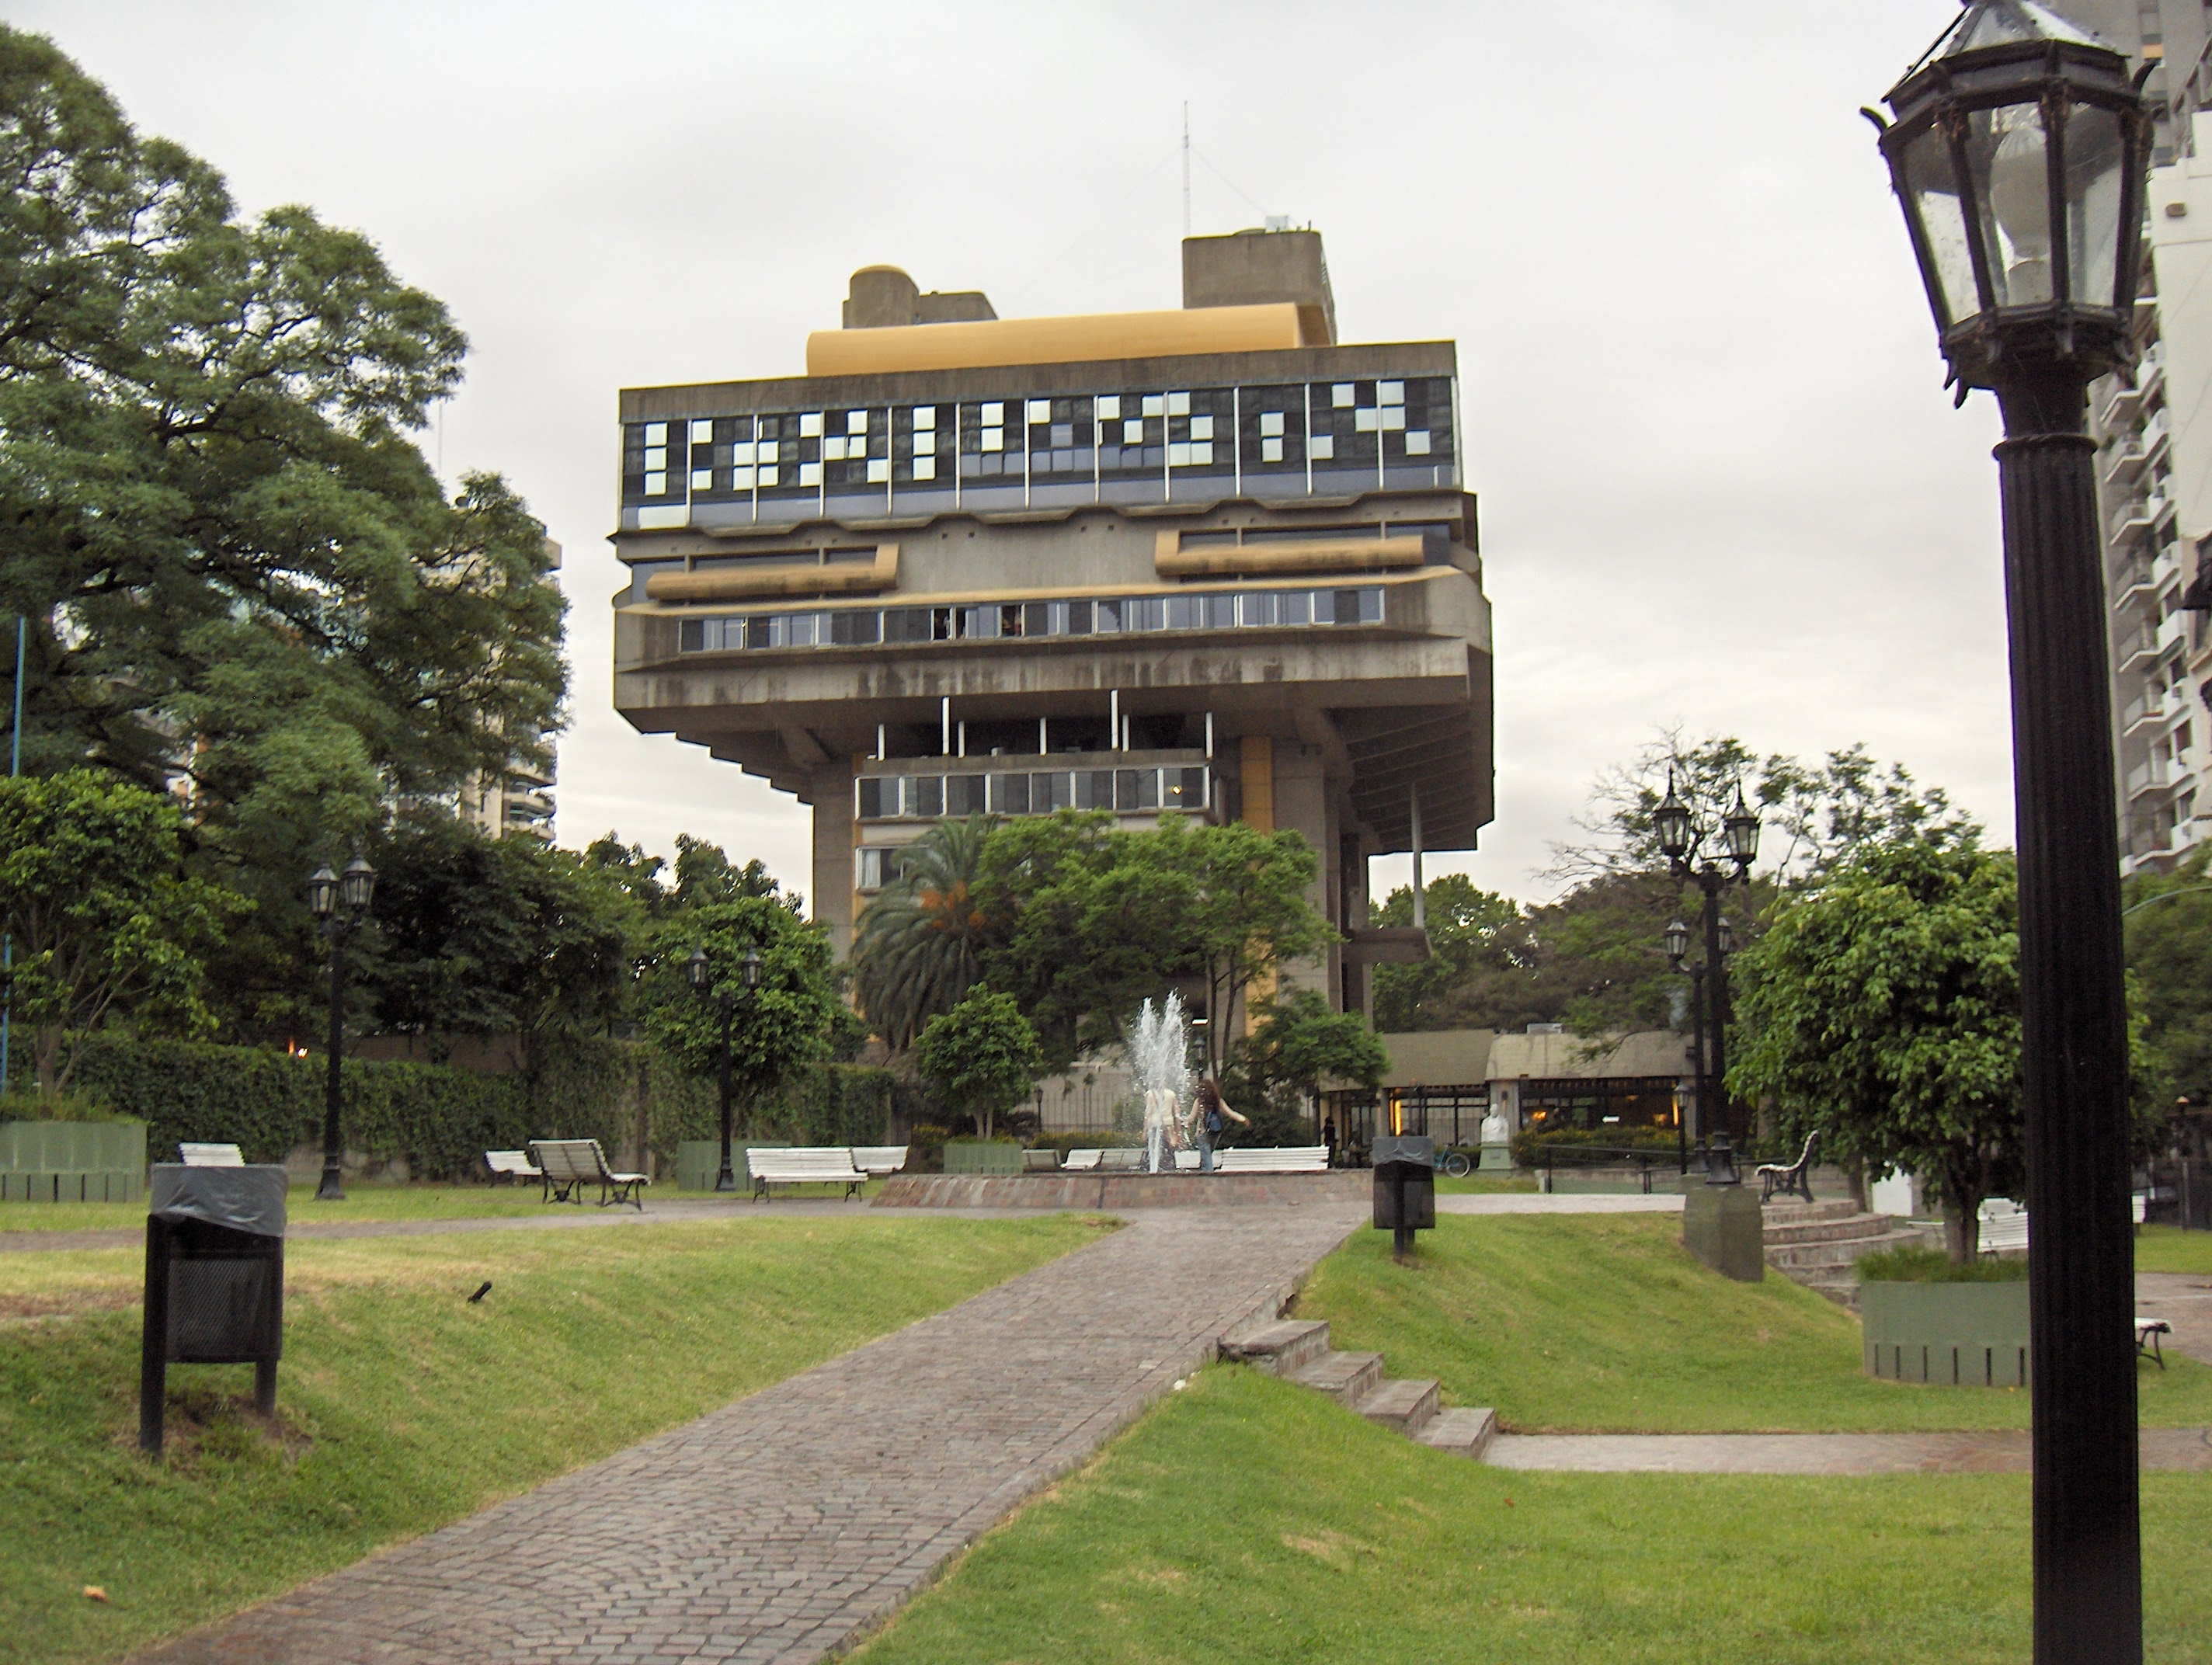 Clorindo Testa: 1923 – 2013